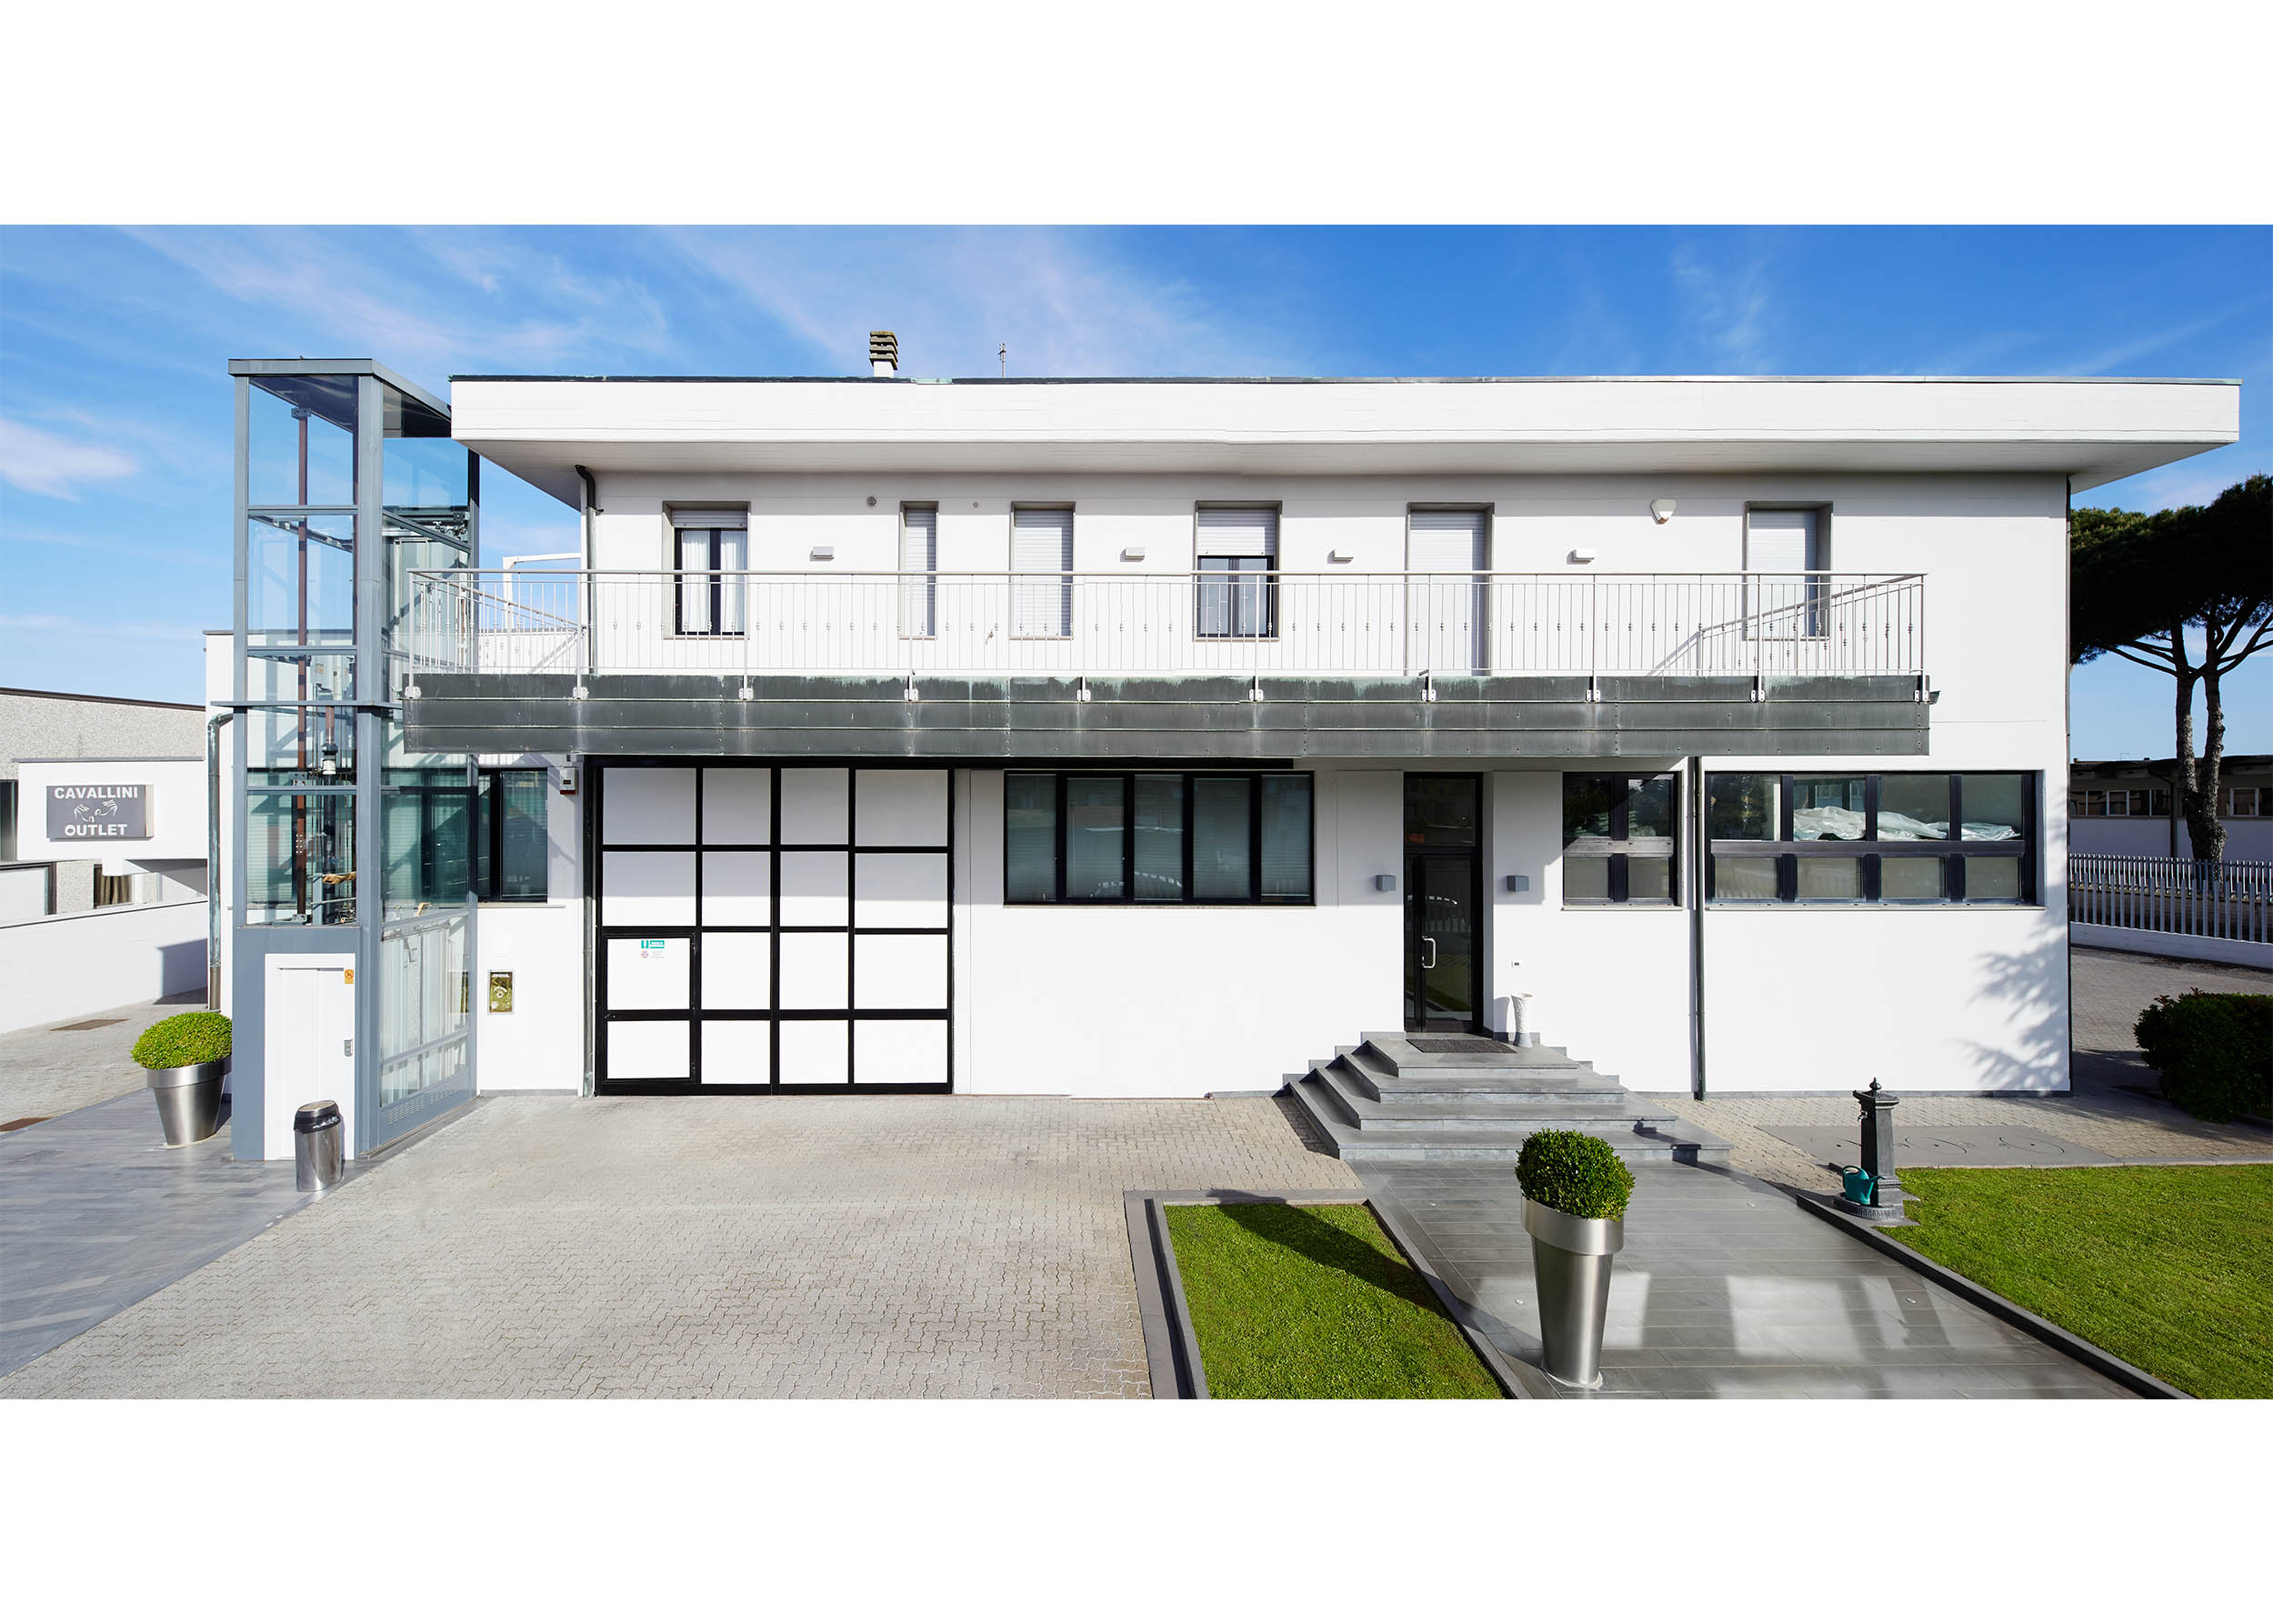 270417_cavallini_fabbrica_panoramica-borders57.jpg